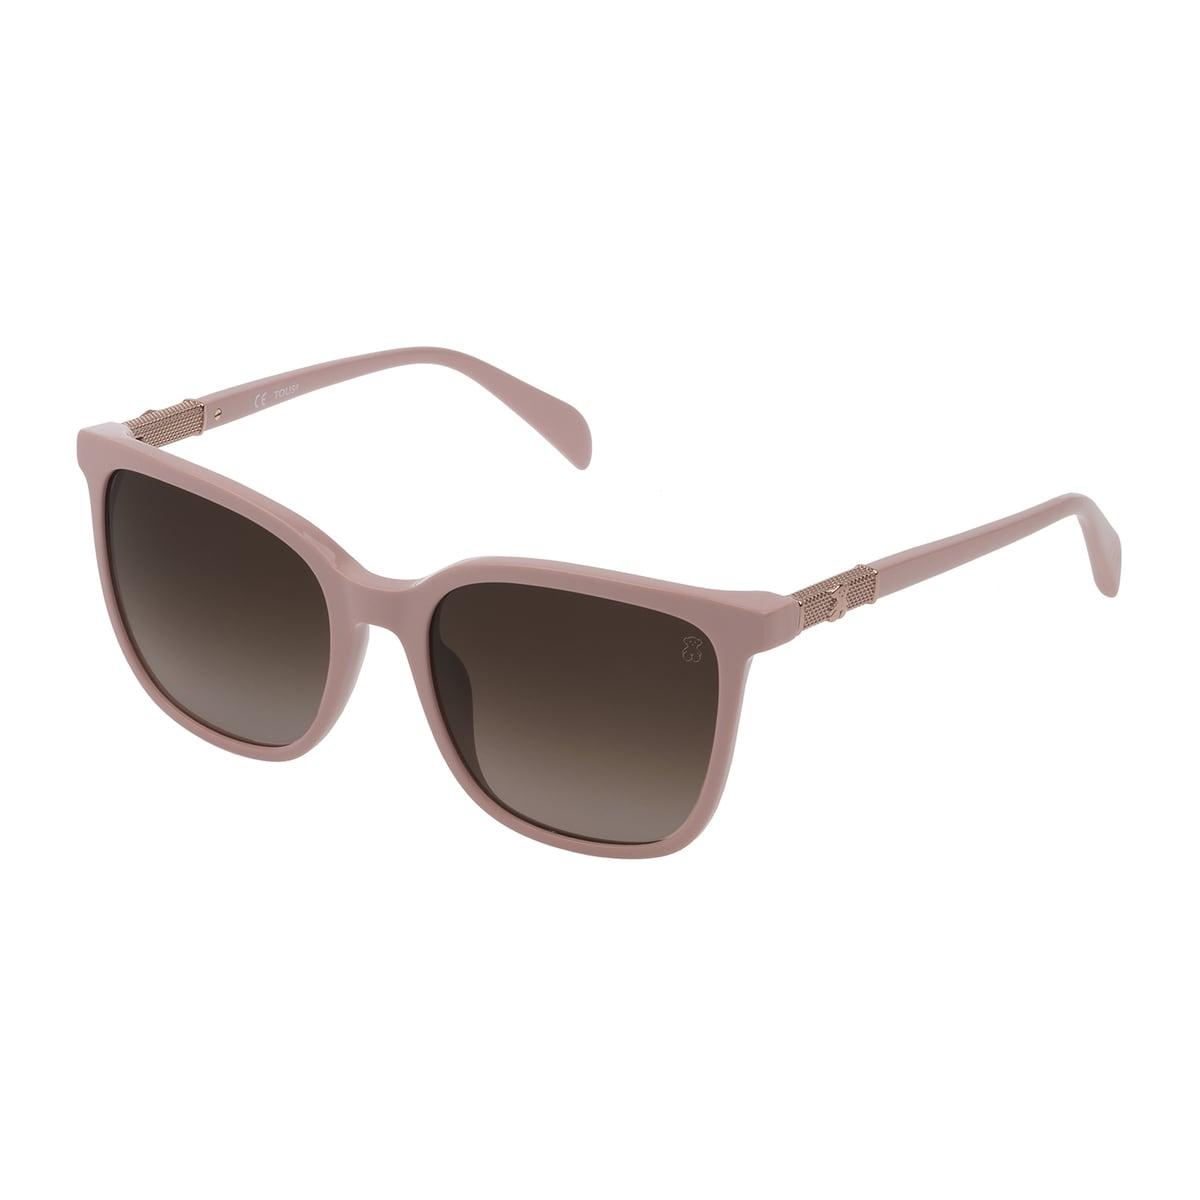 Pink Acetate Mesh Sunglasses